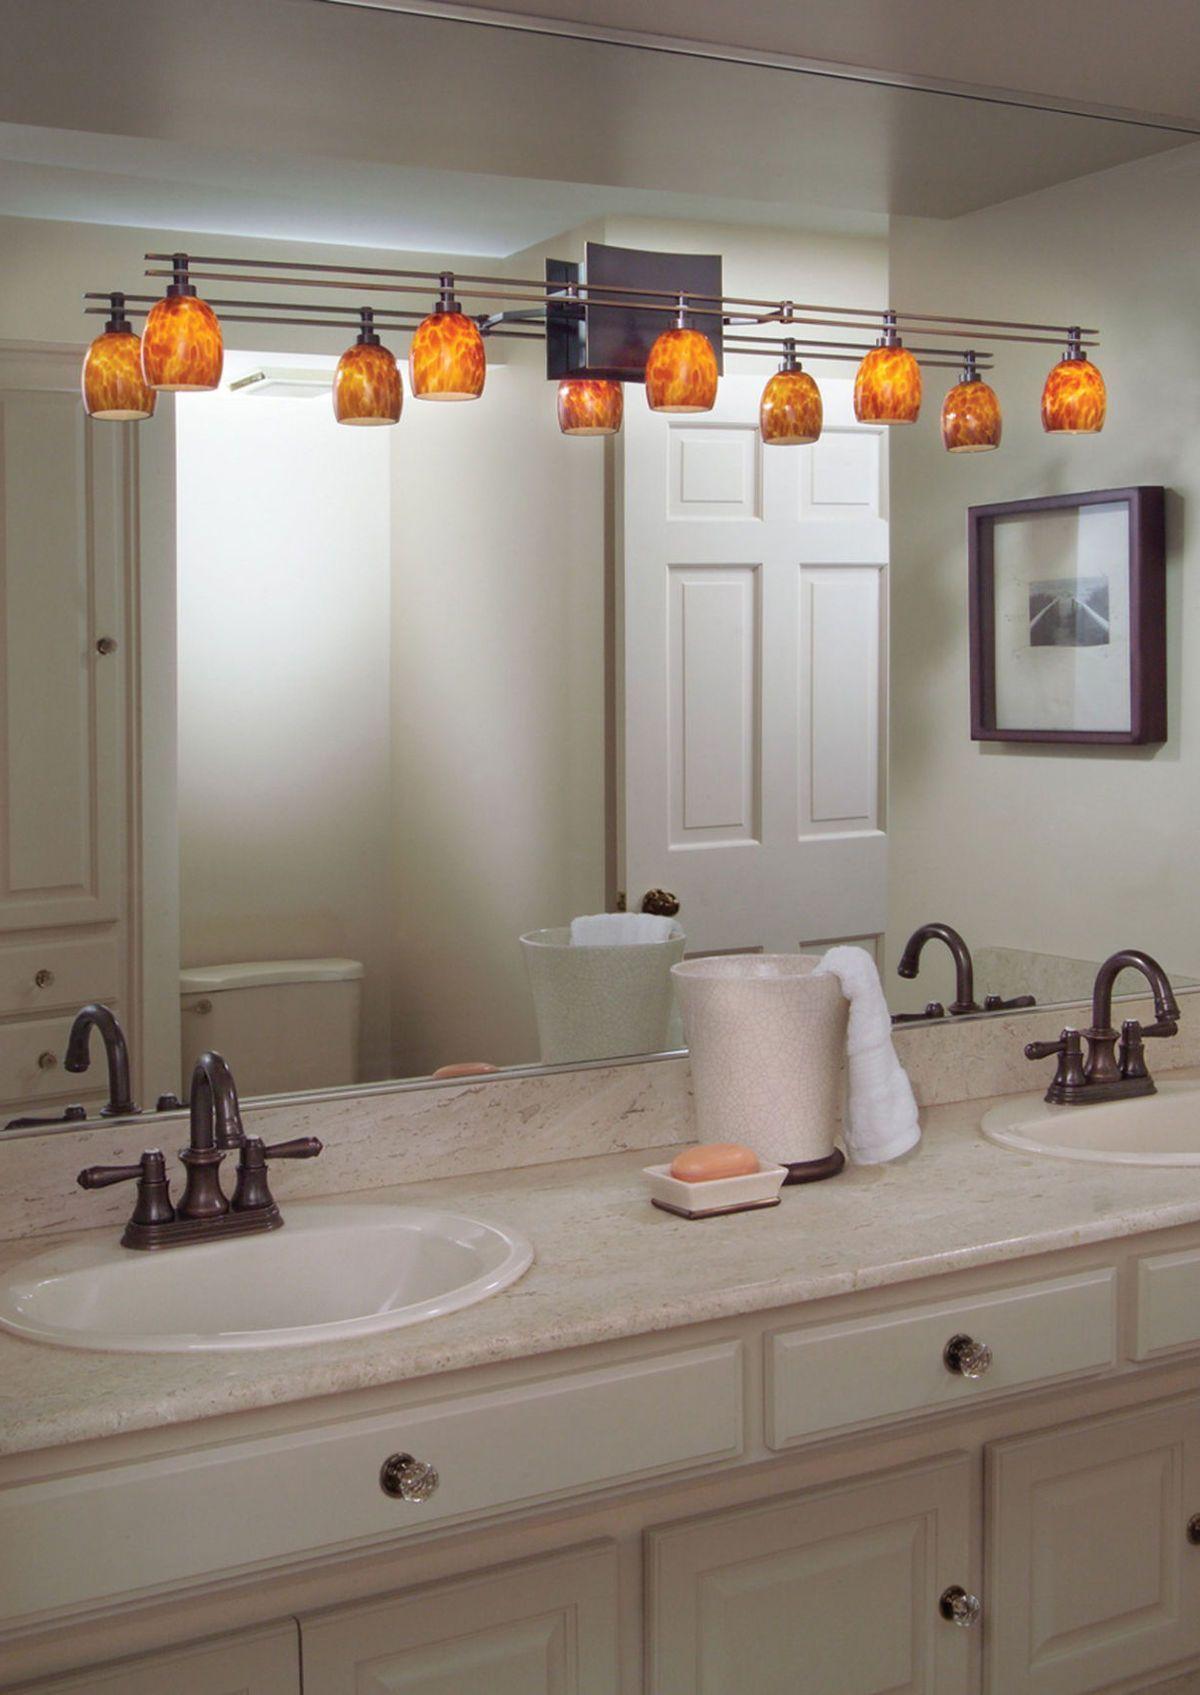 Track Lighting In A Small Bathroom Traditional Bathroom